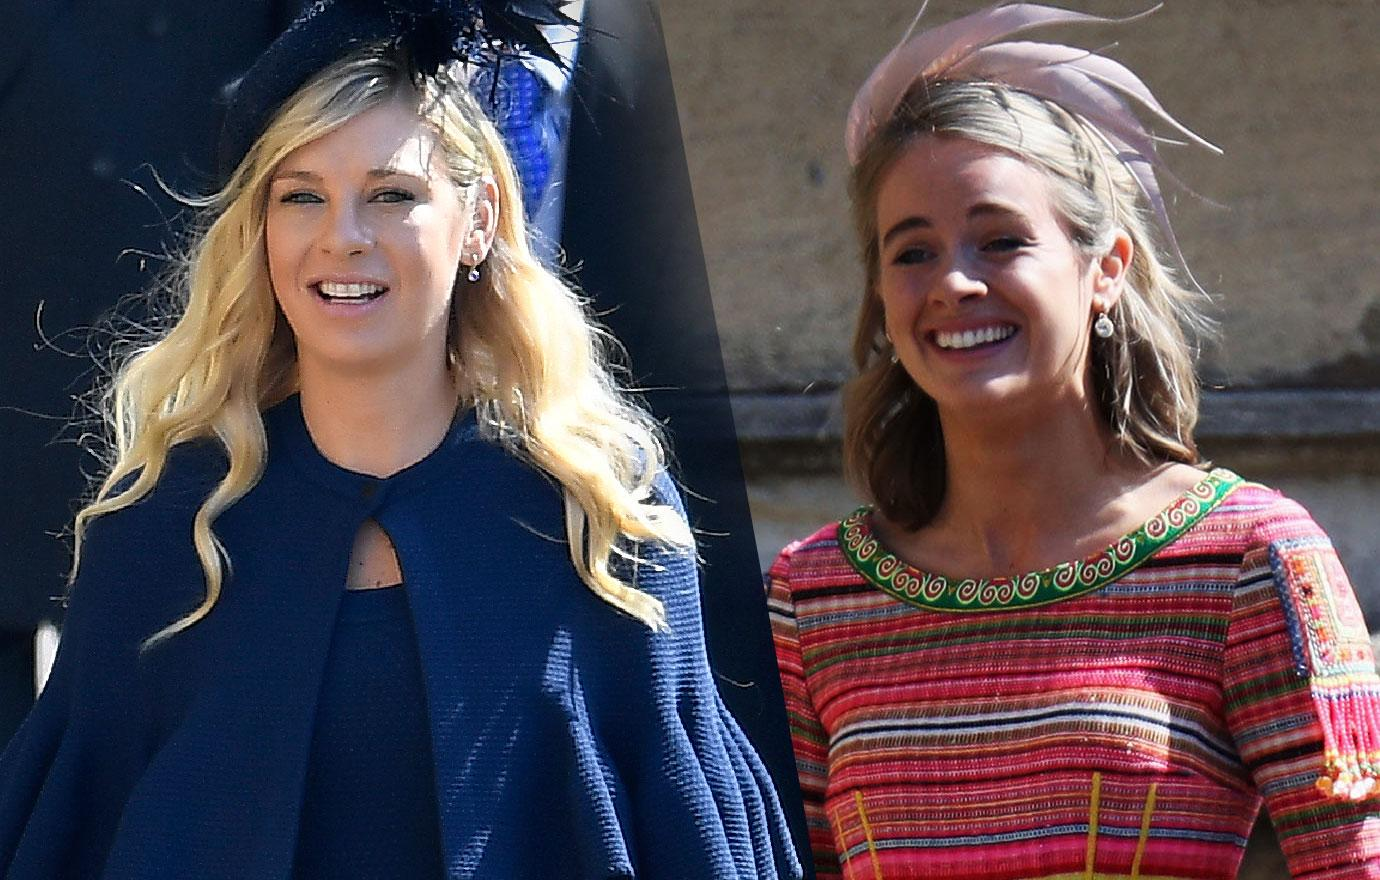 royal wedding prince harry ex girlfriend cressida bonas chelsy davy